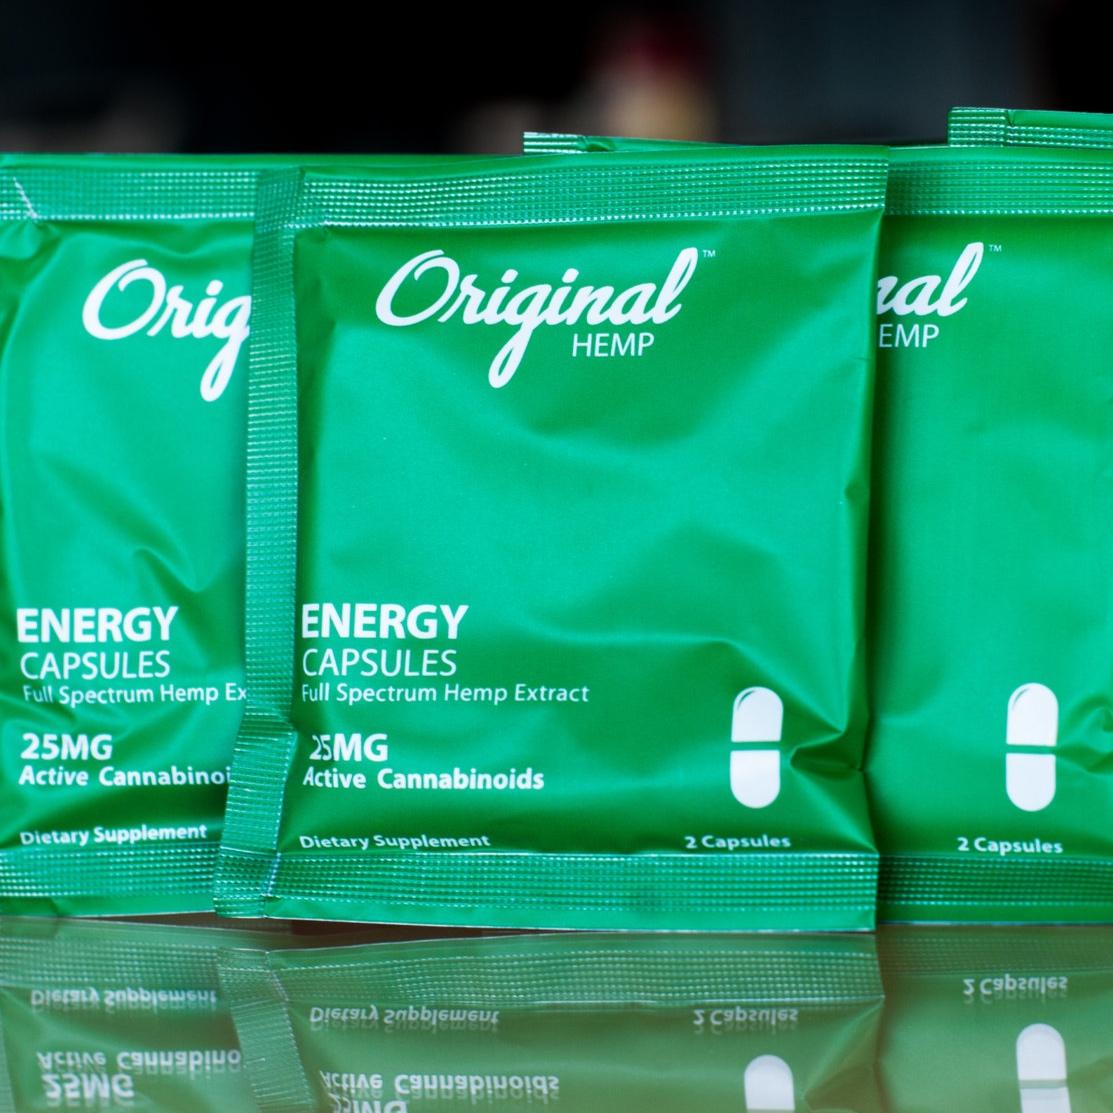 Original+Hemp+Energy+Capsules.jpg